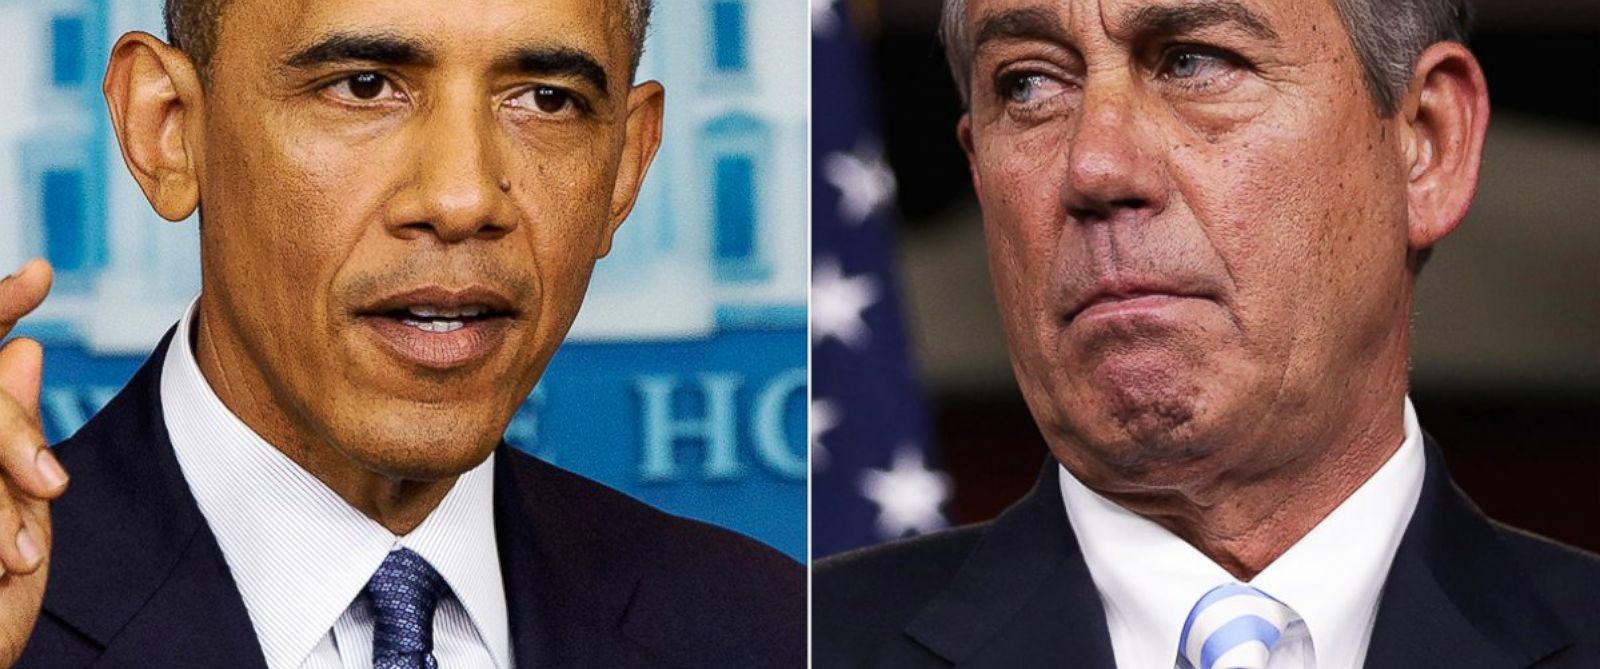 PHOTO: President Barack Obama, left, speaks at the White House in Washington, D.C. on Aug. 1, 2014. Rep. John Boehner, right, is pictured in Washington, D.C. on July 31, 2014.